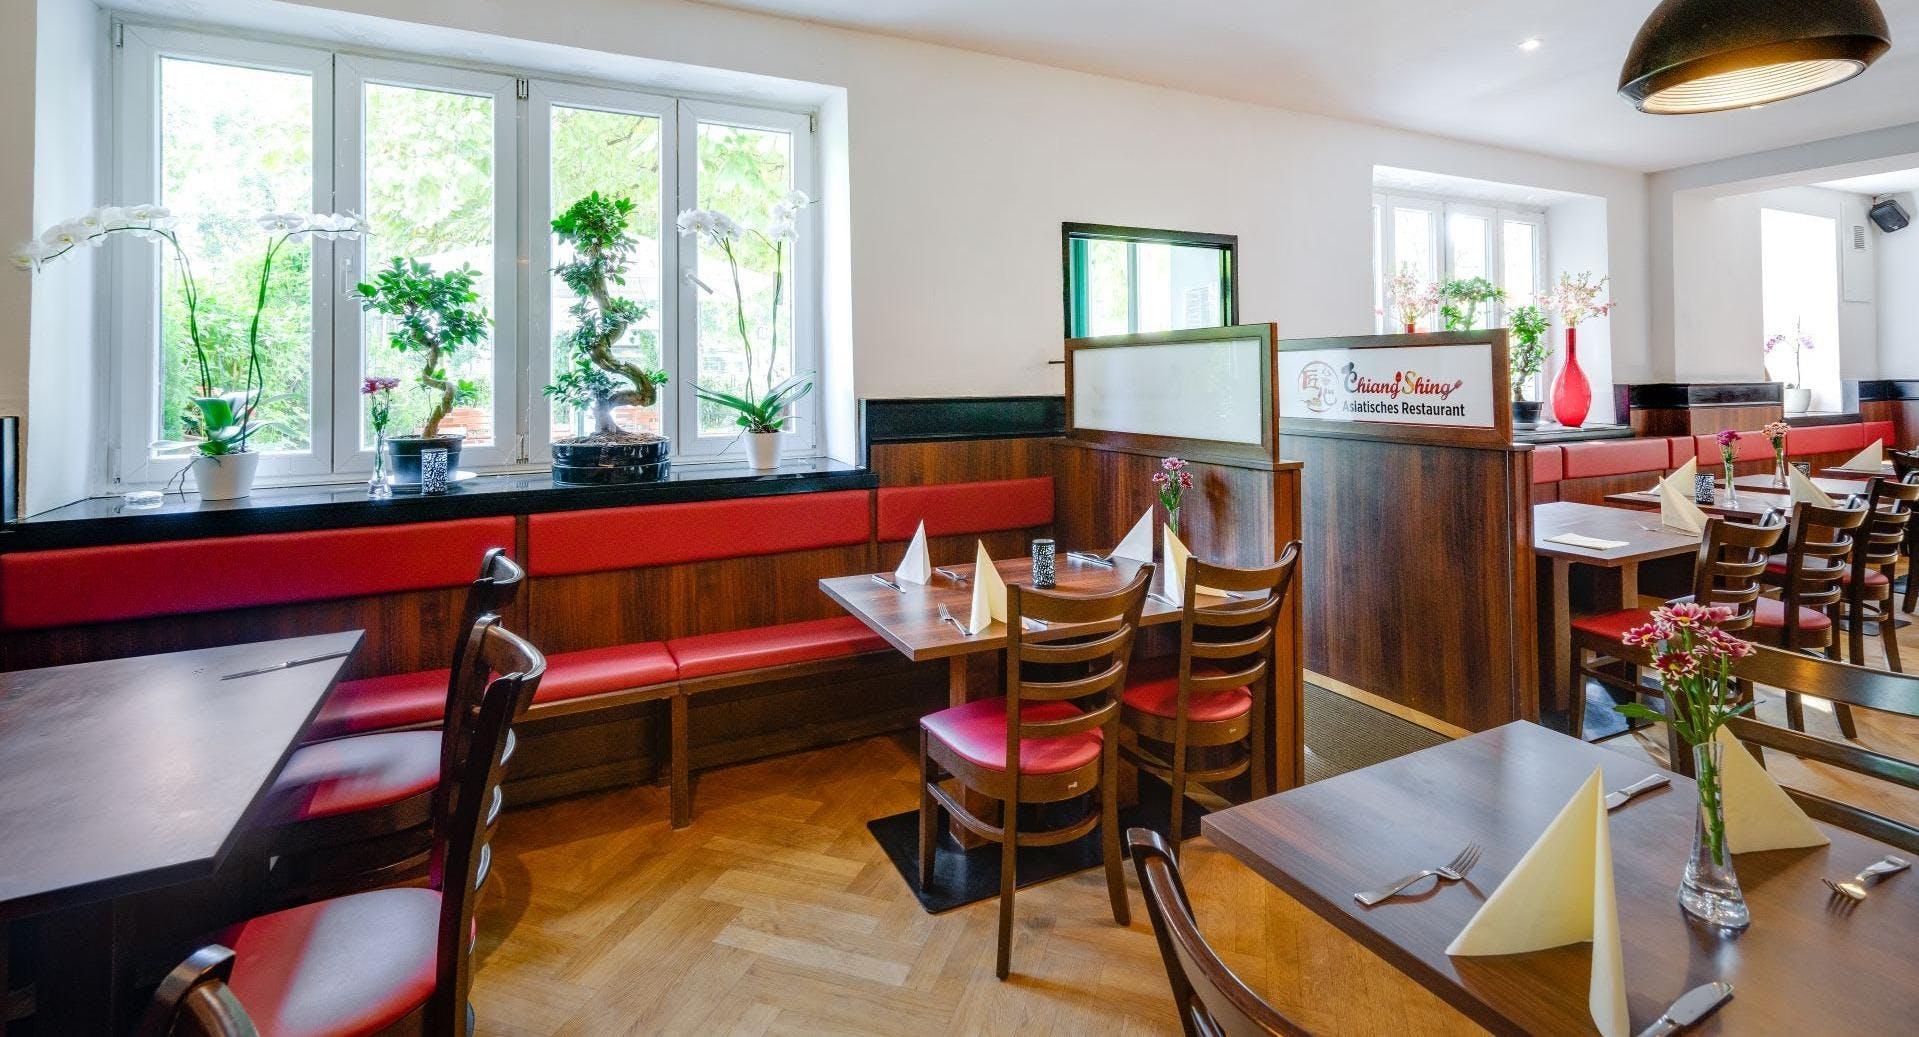 ChiangShing Restaurant Munich image 3